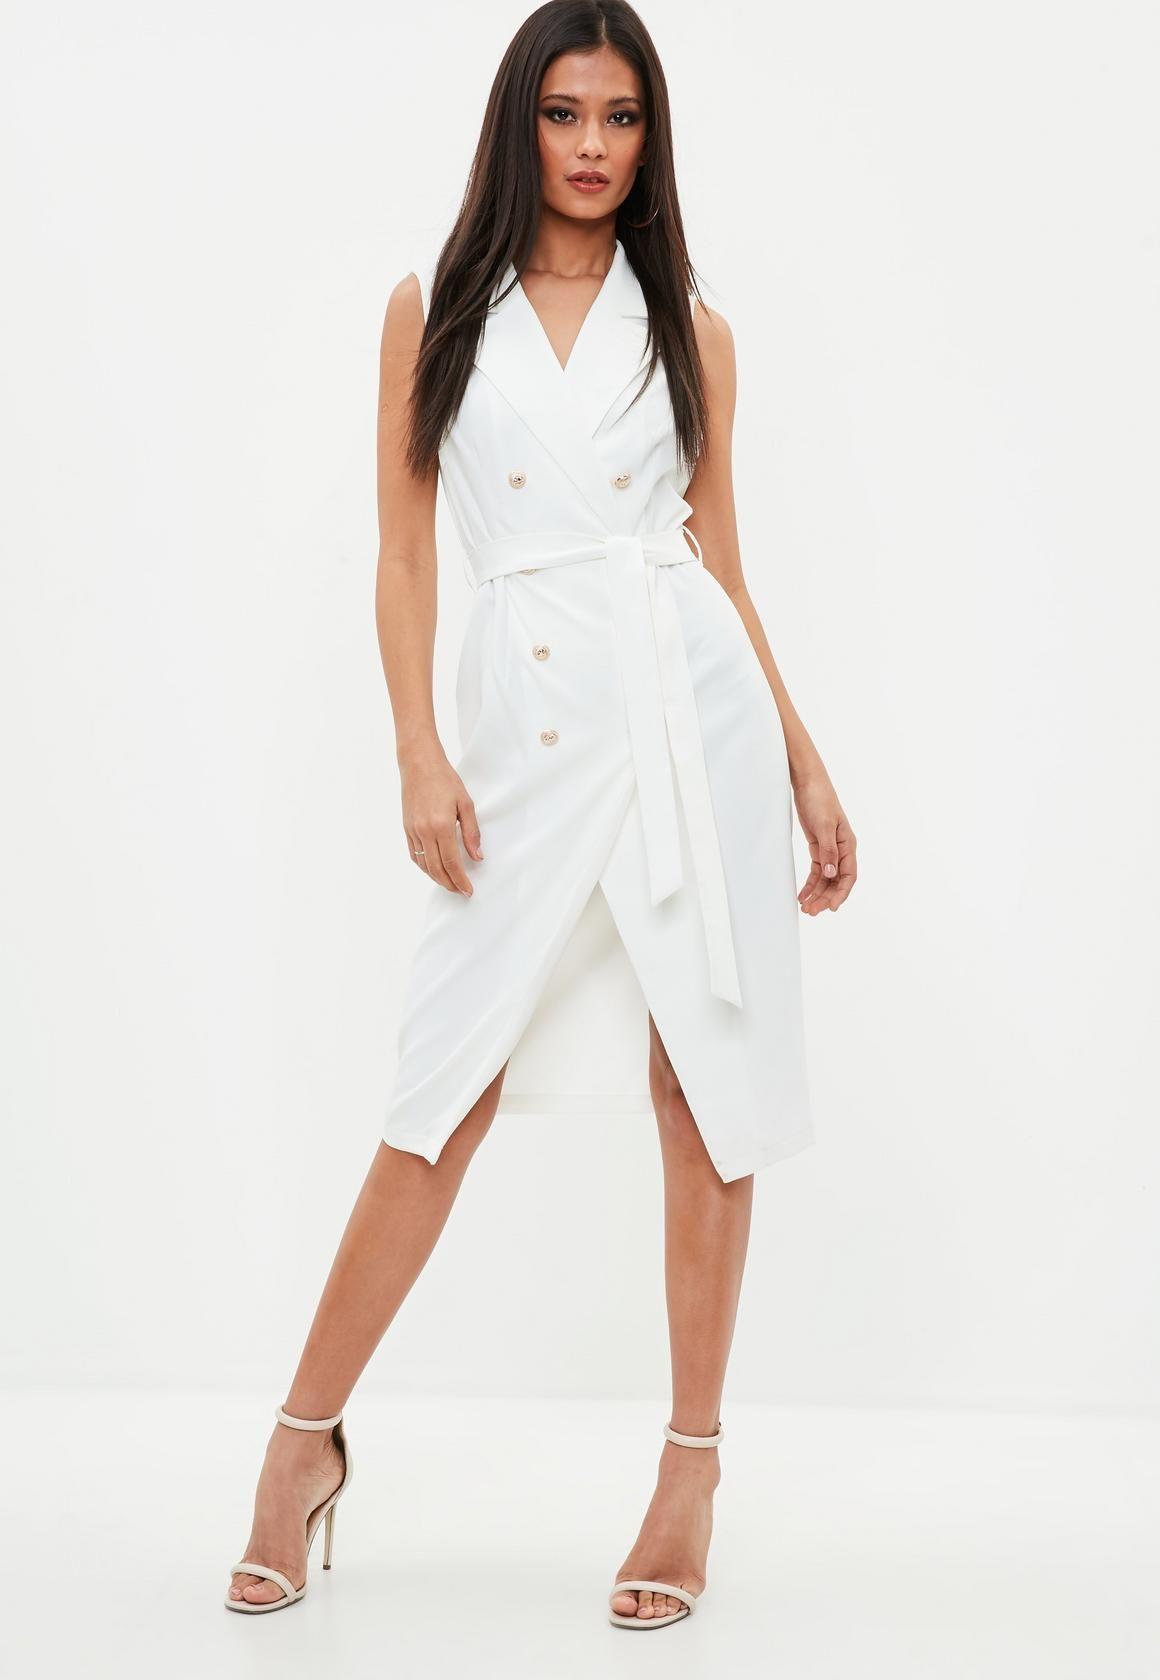 091b8e4a78740d Missguided - White Sleeveless Belted Midi Blazer Dress